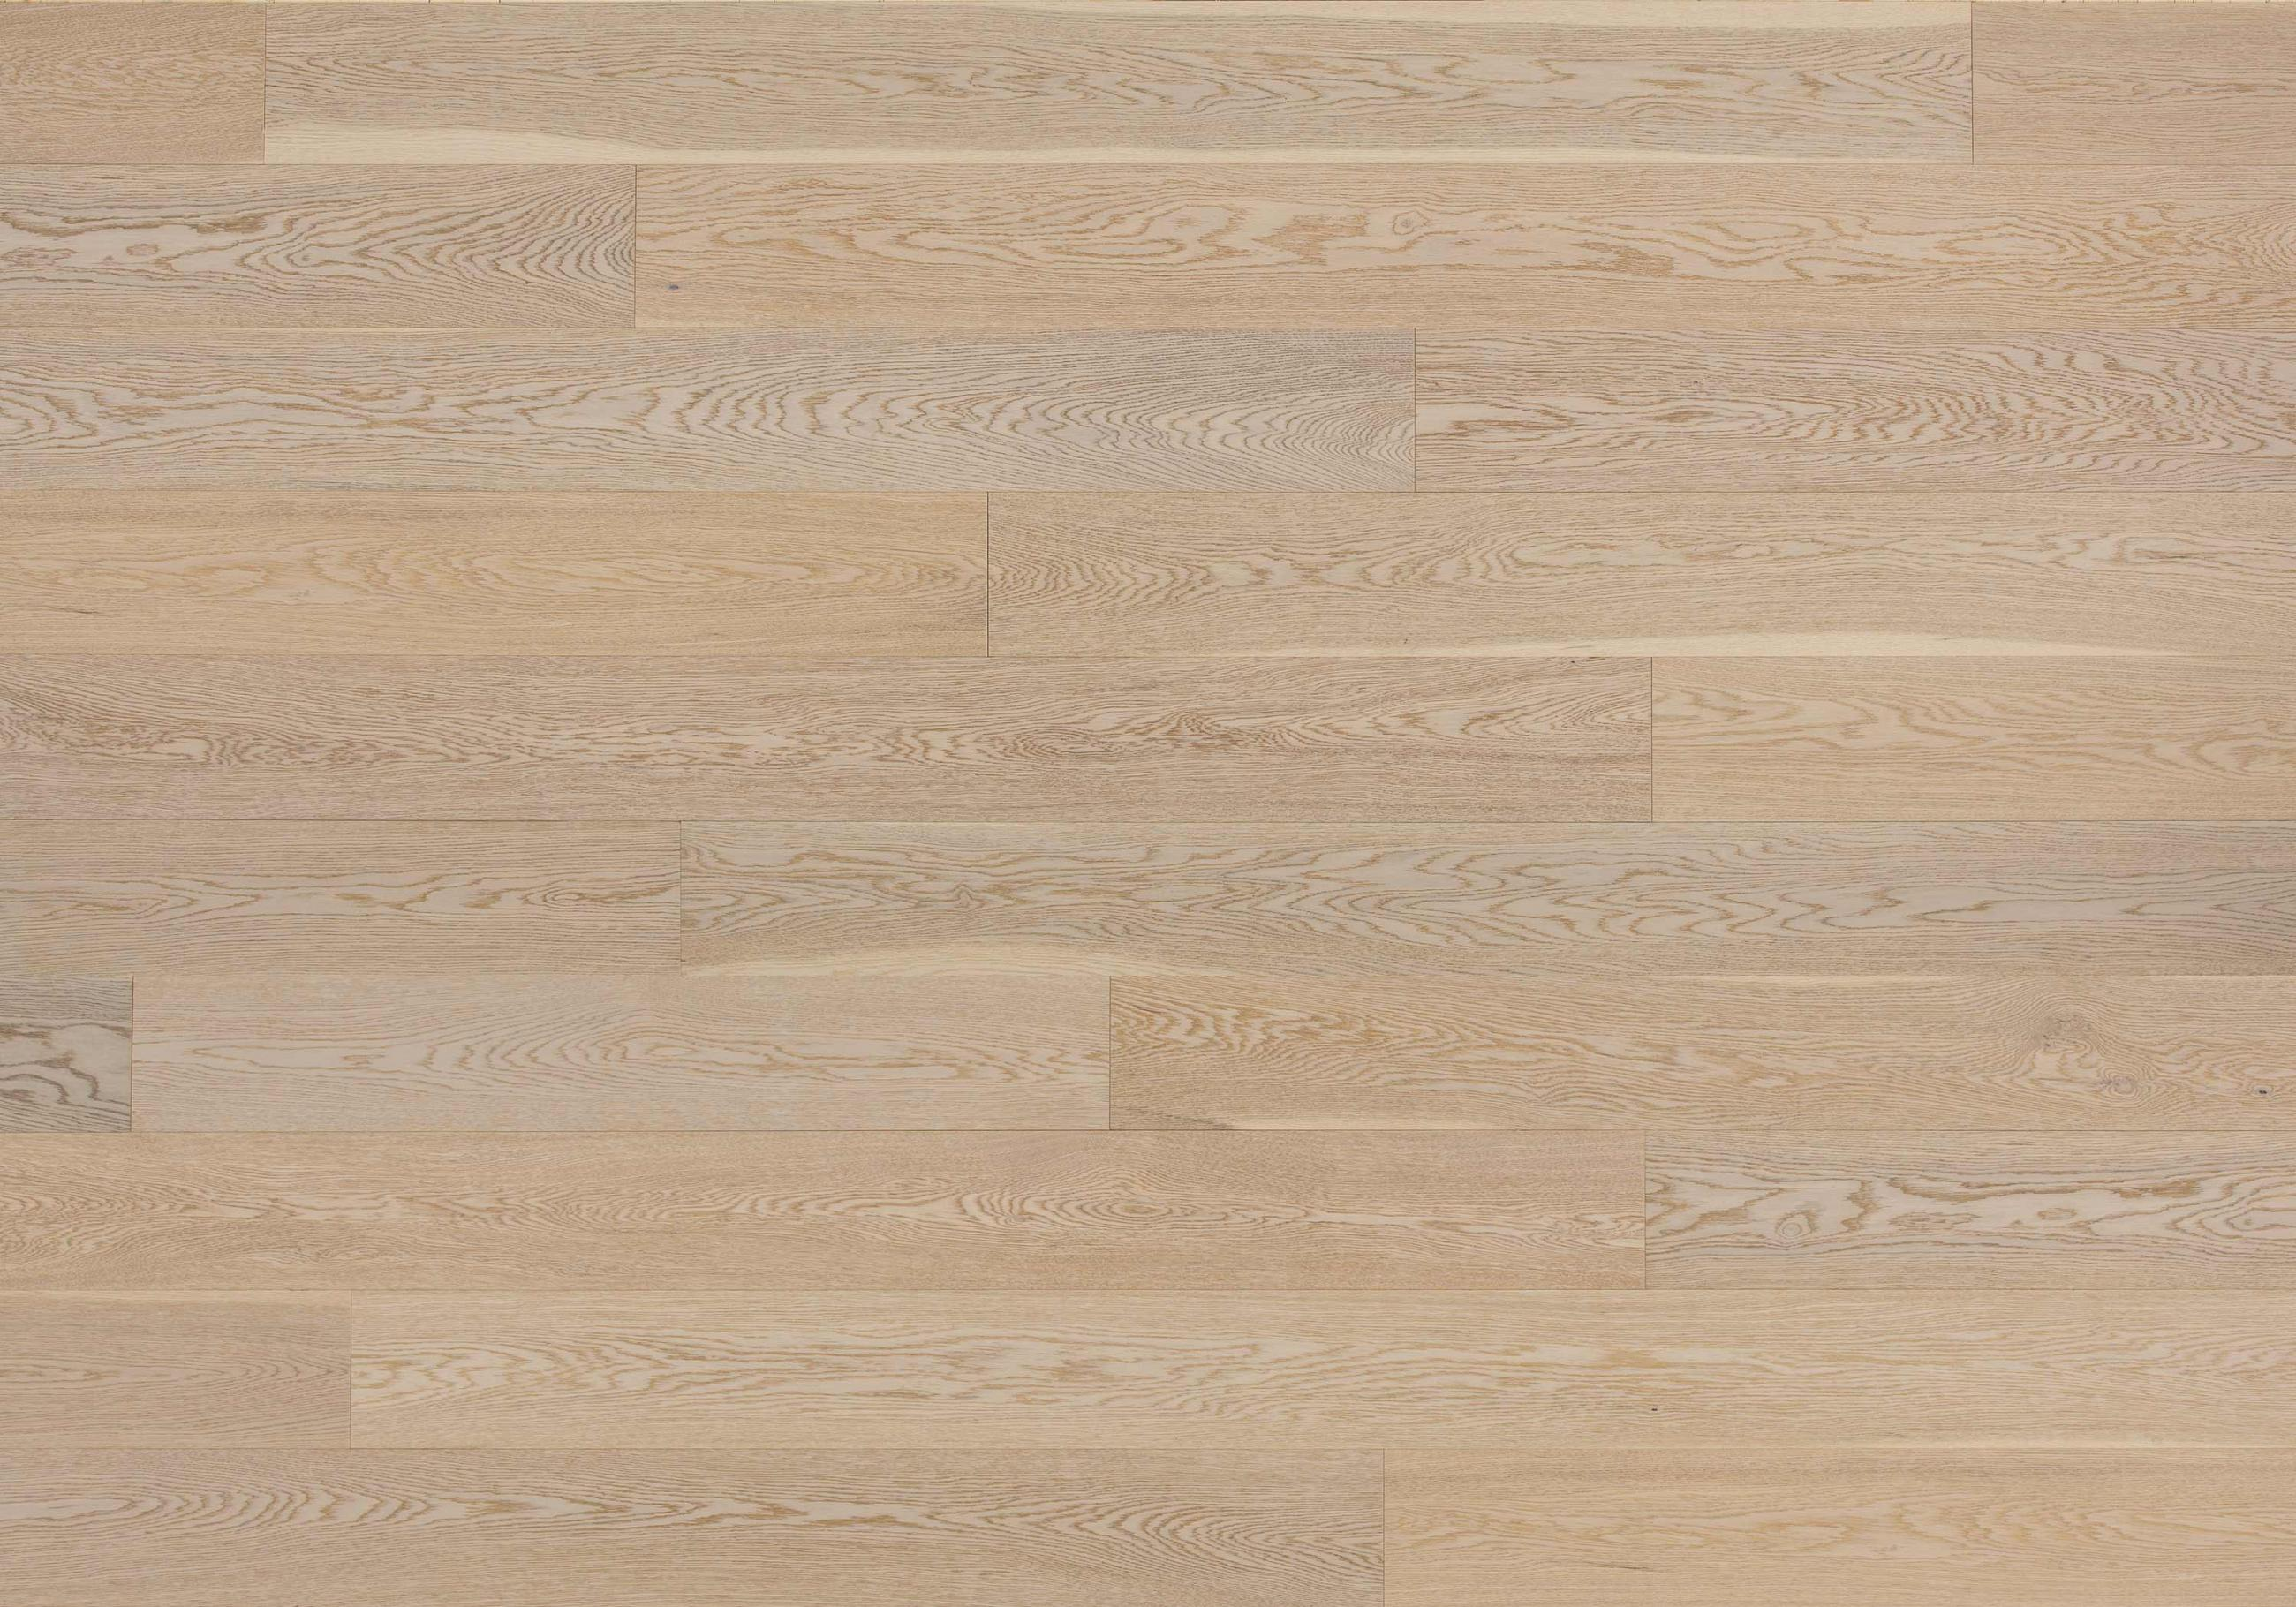 Lauzon Designer Collection Urban Loft Series White Oak Chelsea Cream : AA Floors Toronto